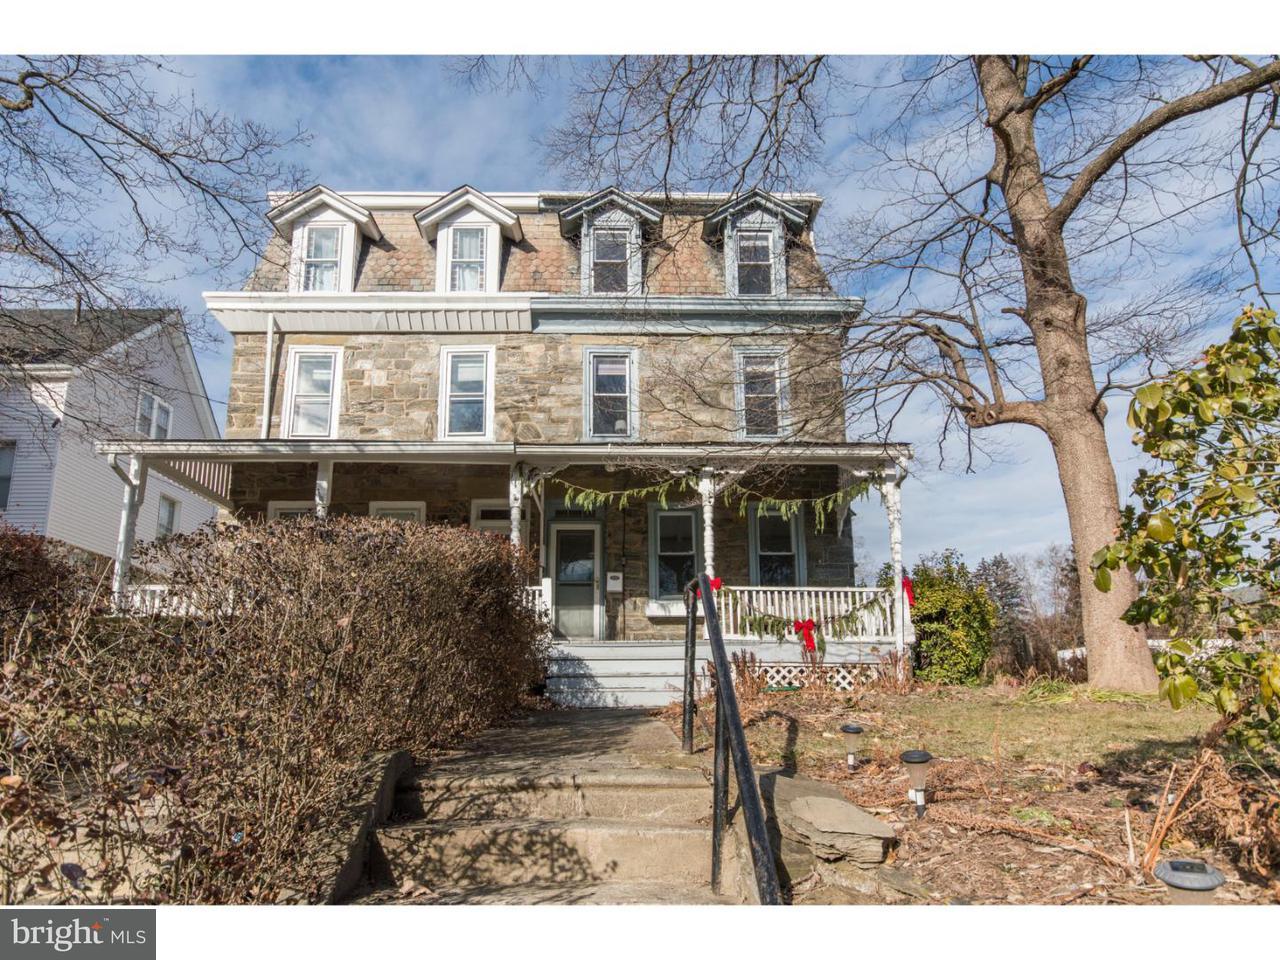 439 E Mount Airy Philadelphia , PA 19119